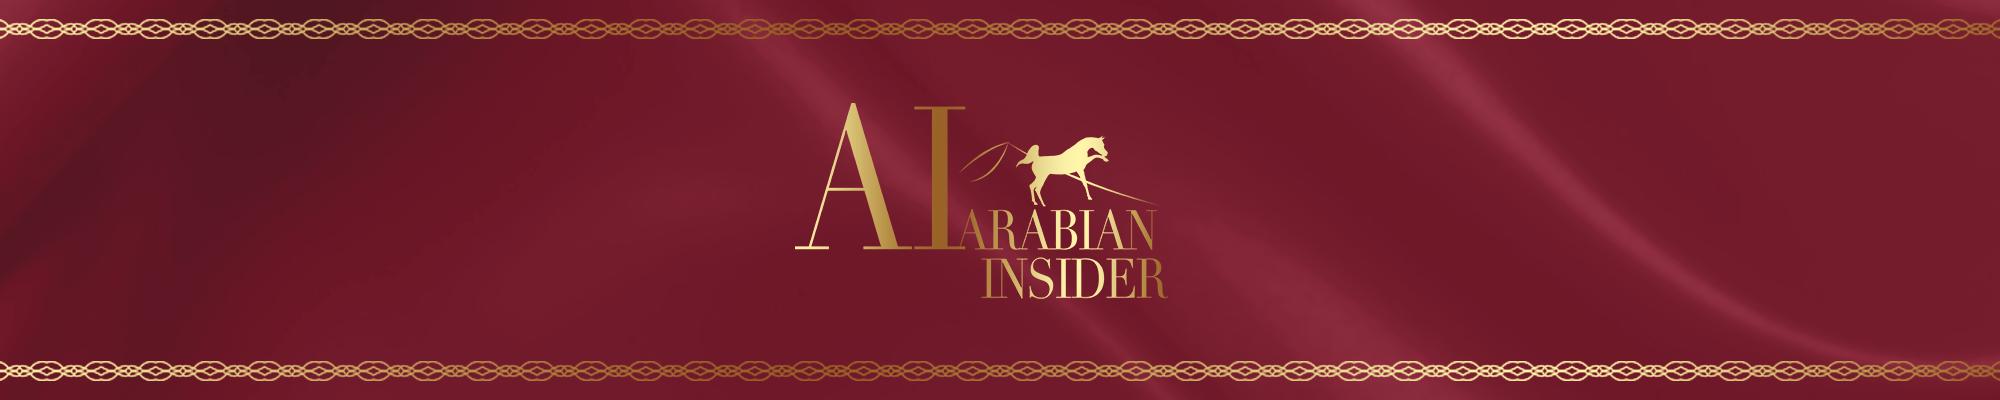 Arabian-insider